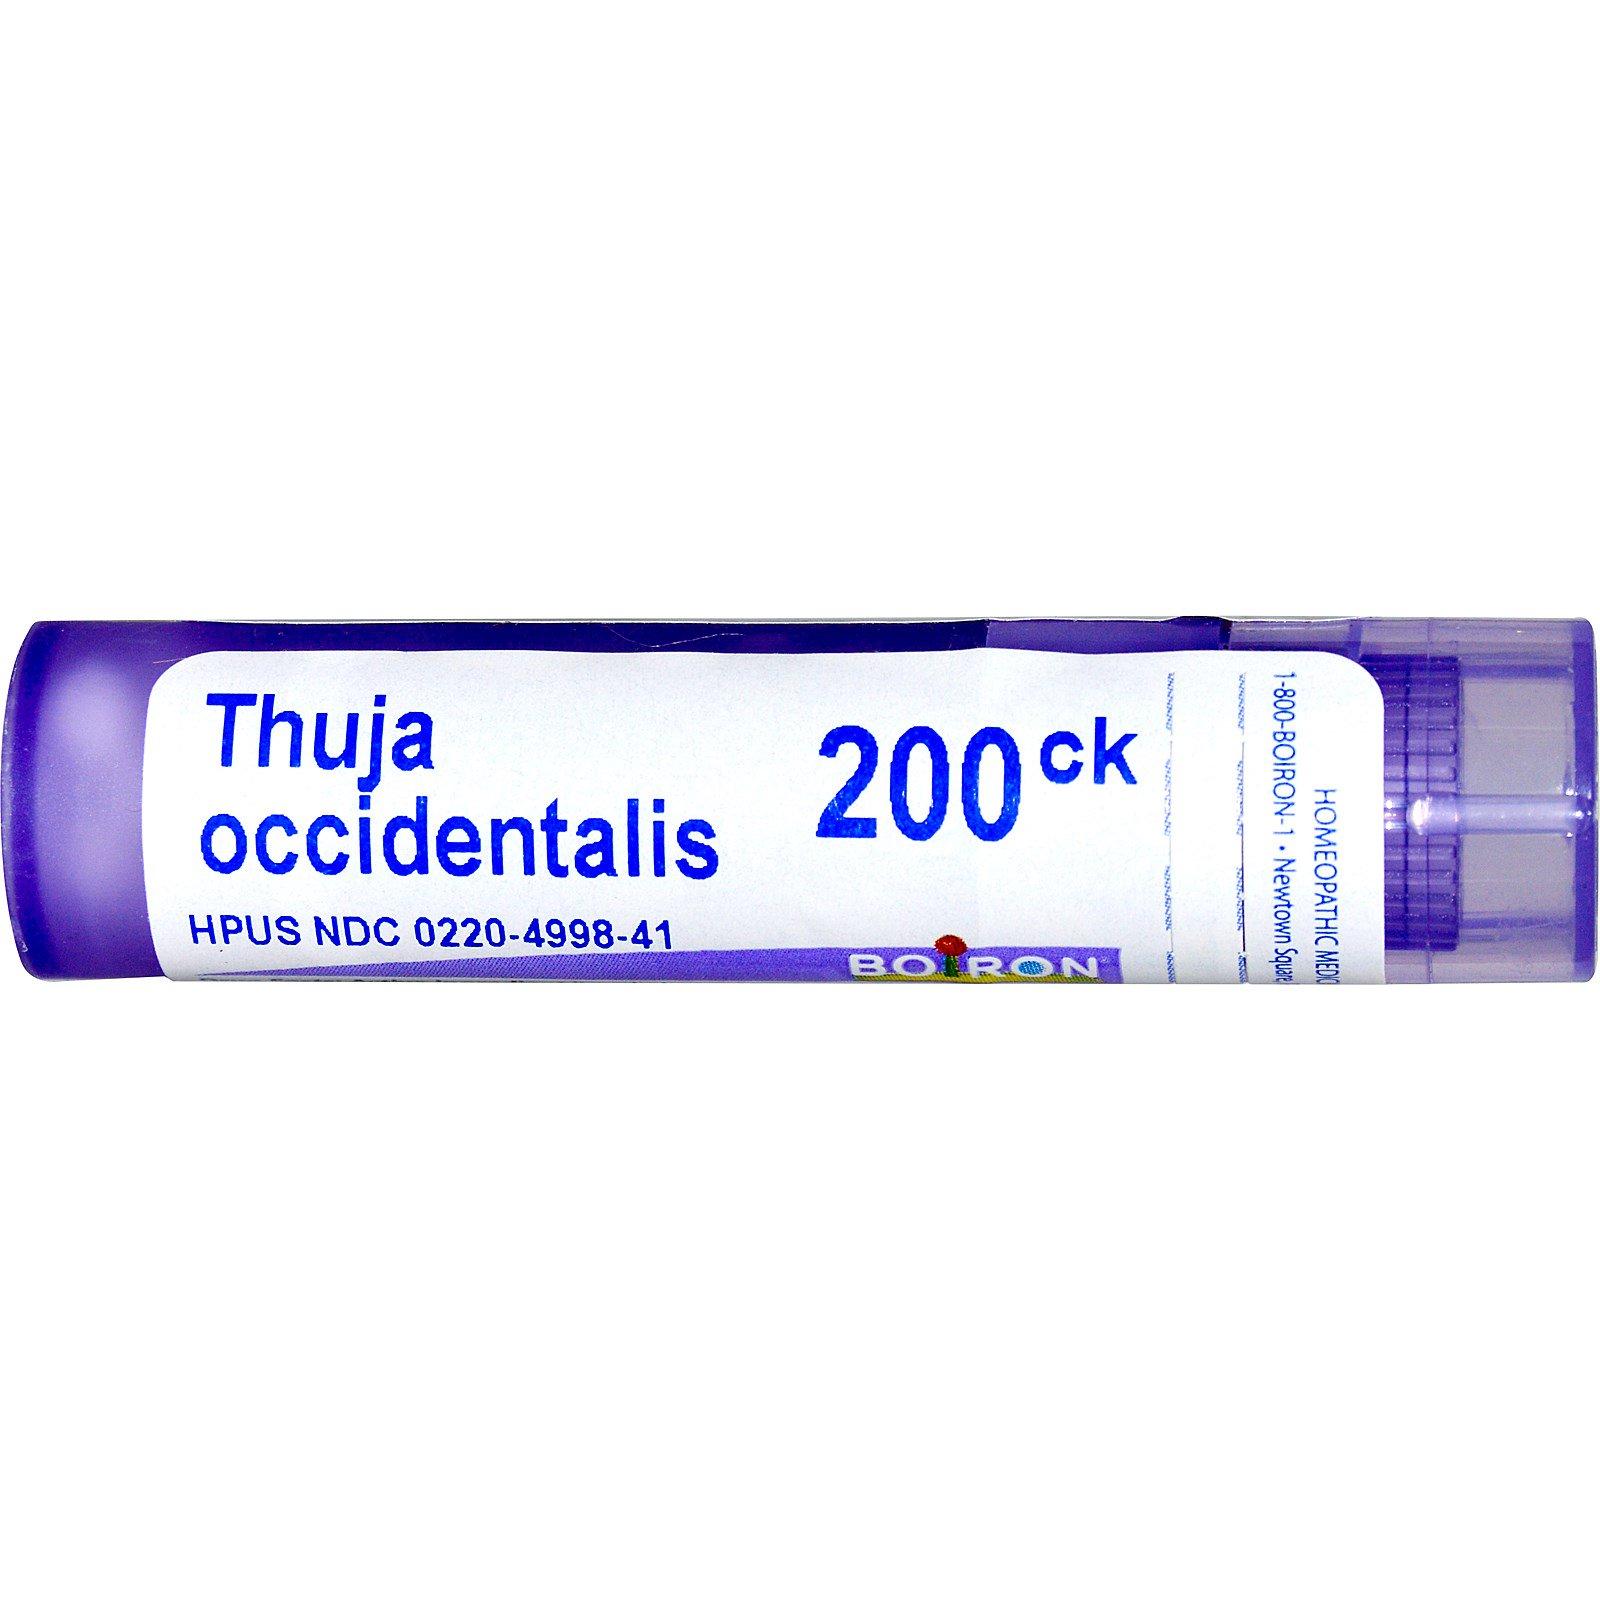 Boiron, Single Remedies, Thuja Occidentalis, 200CK, 80 Pellets